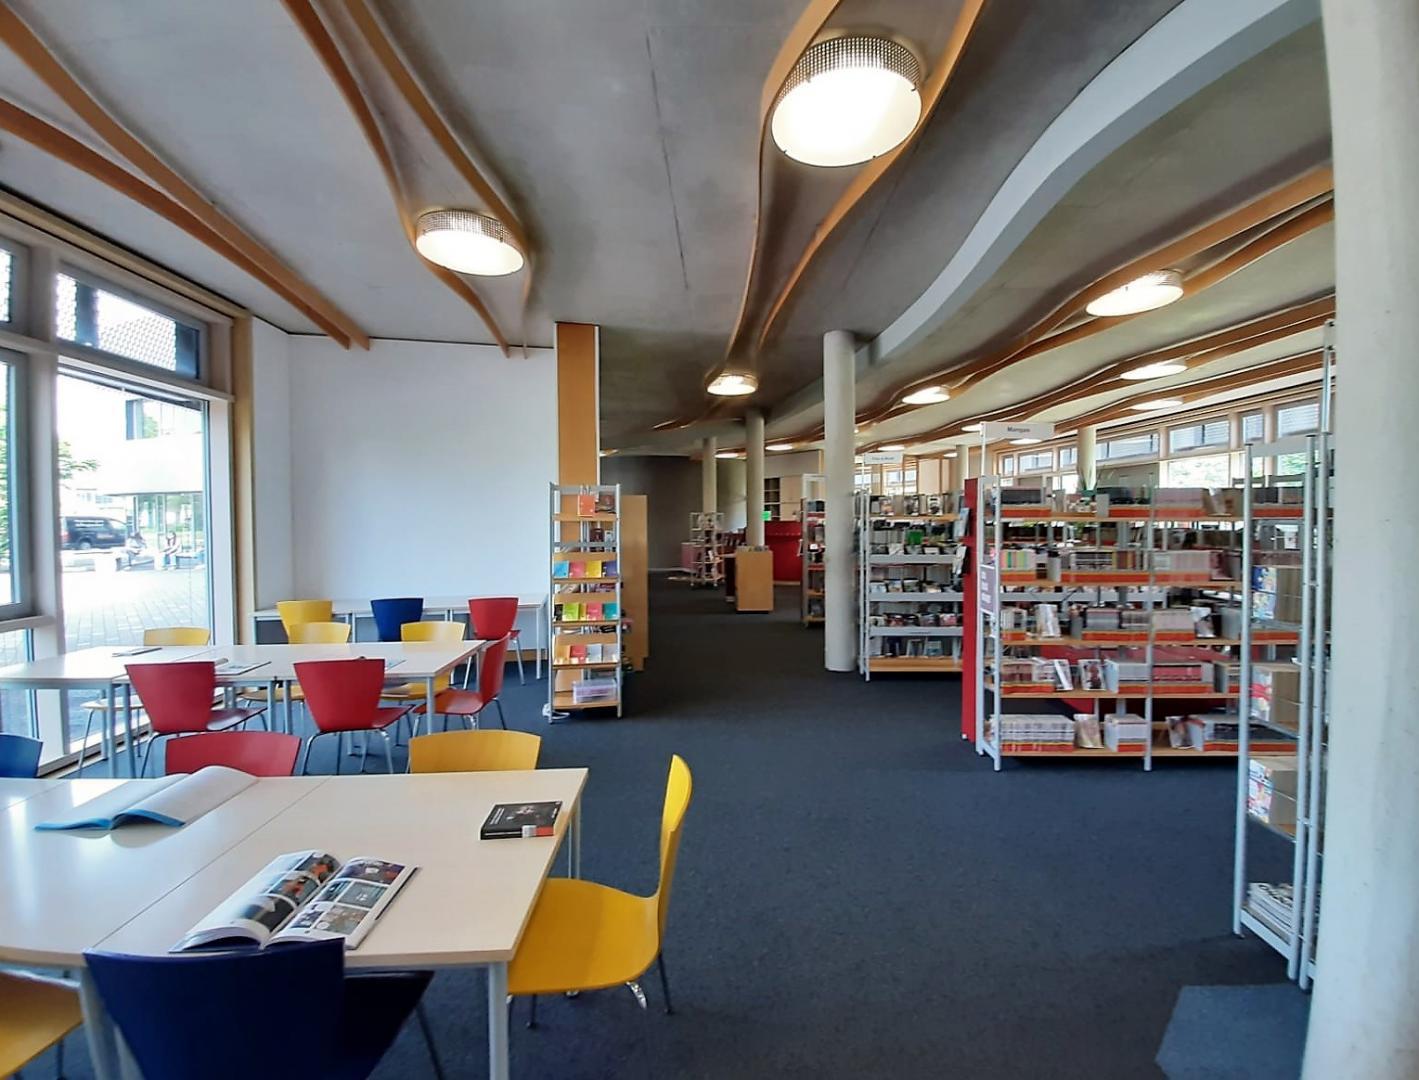 Schulbibliothek Haßfurt